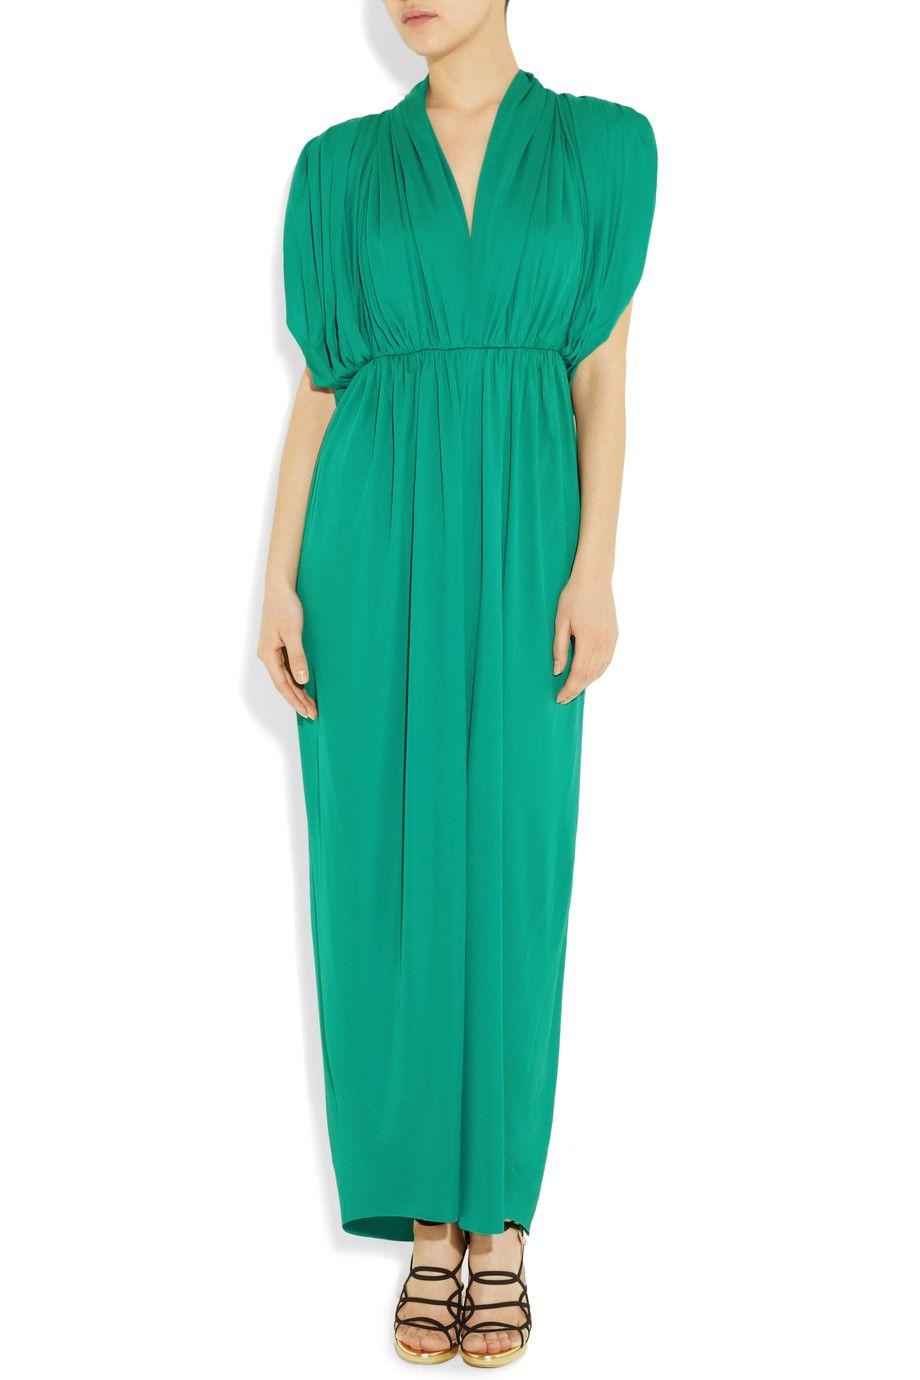 Lanvin Draped Crepe-jersey Maxi Dress in Green (sea) | Lyst